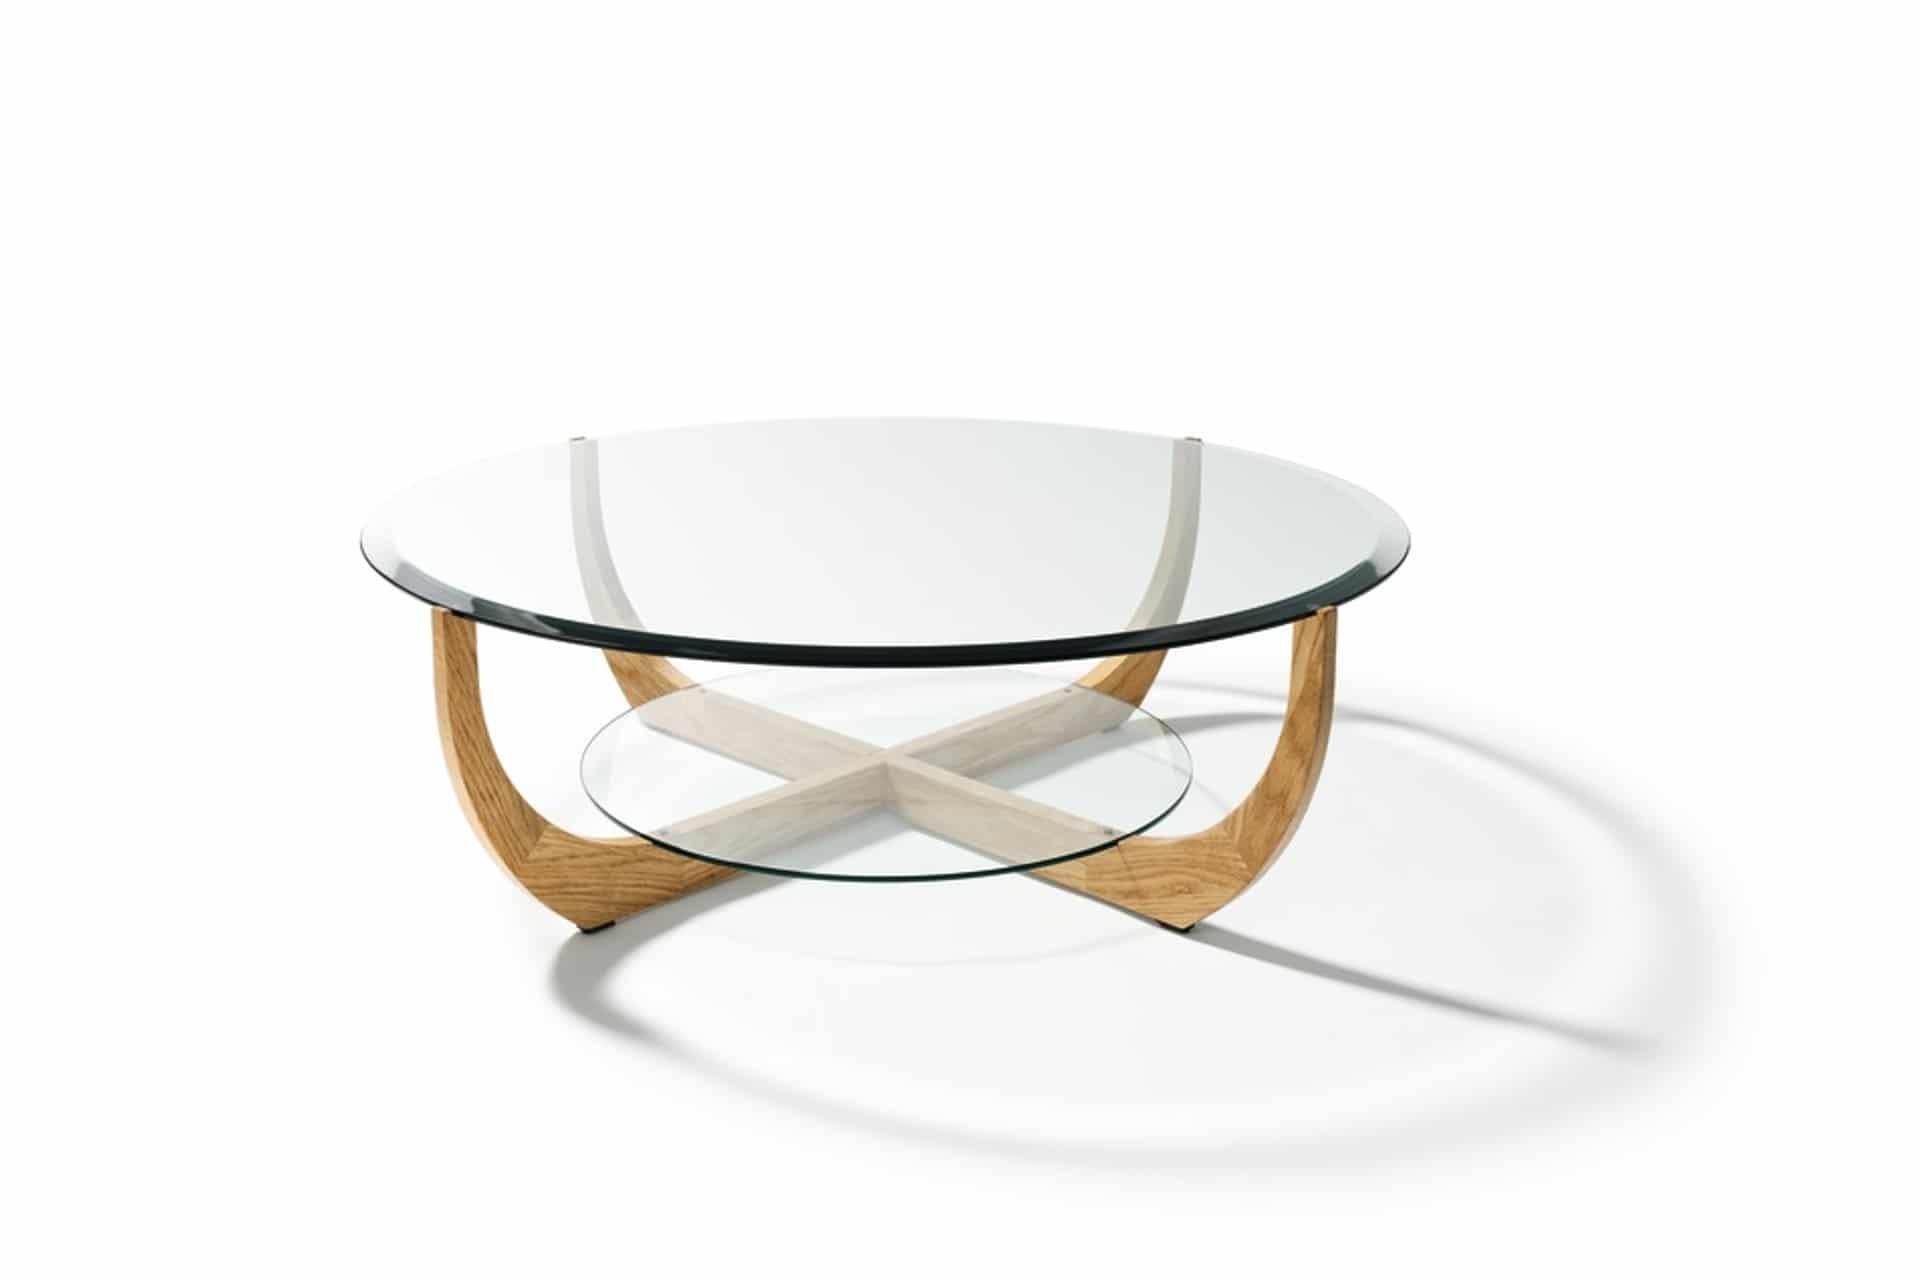 couchtisch juwel bensberg wohnen. Black Bedroom Furniture Sets. Home Design Ideas